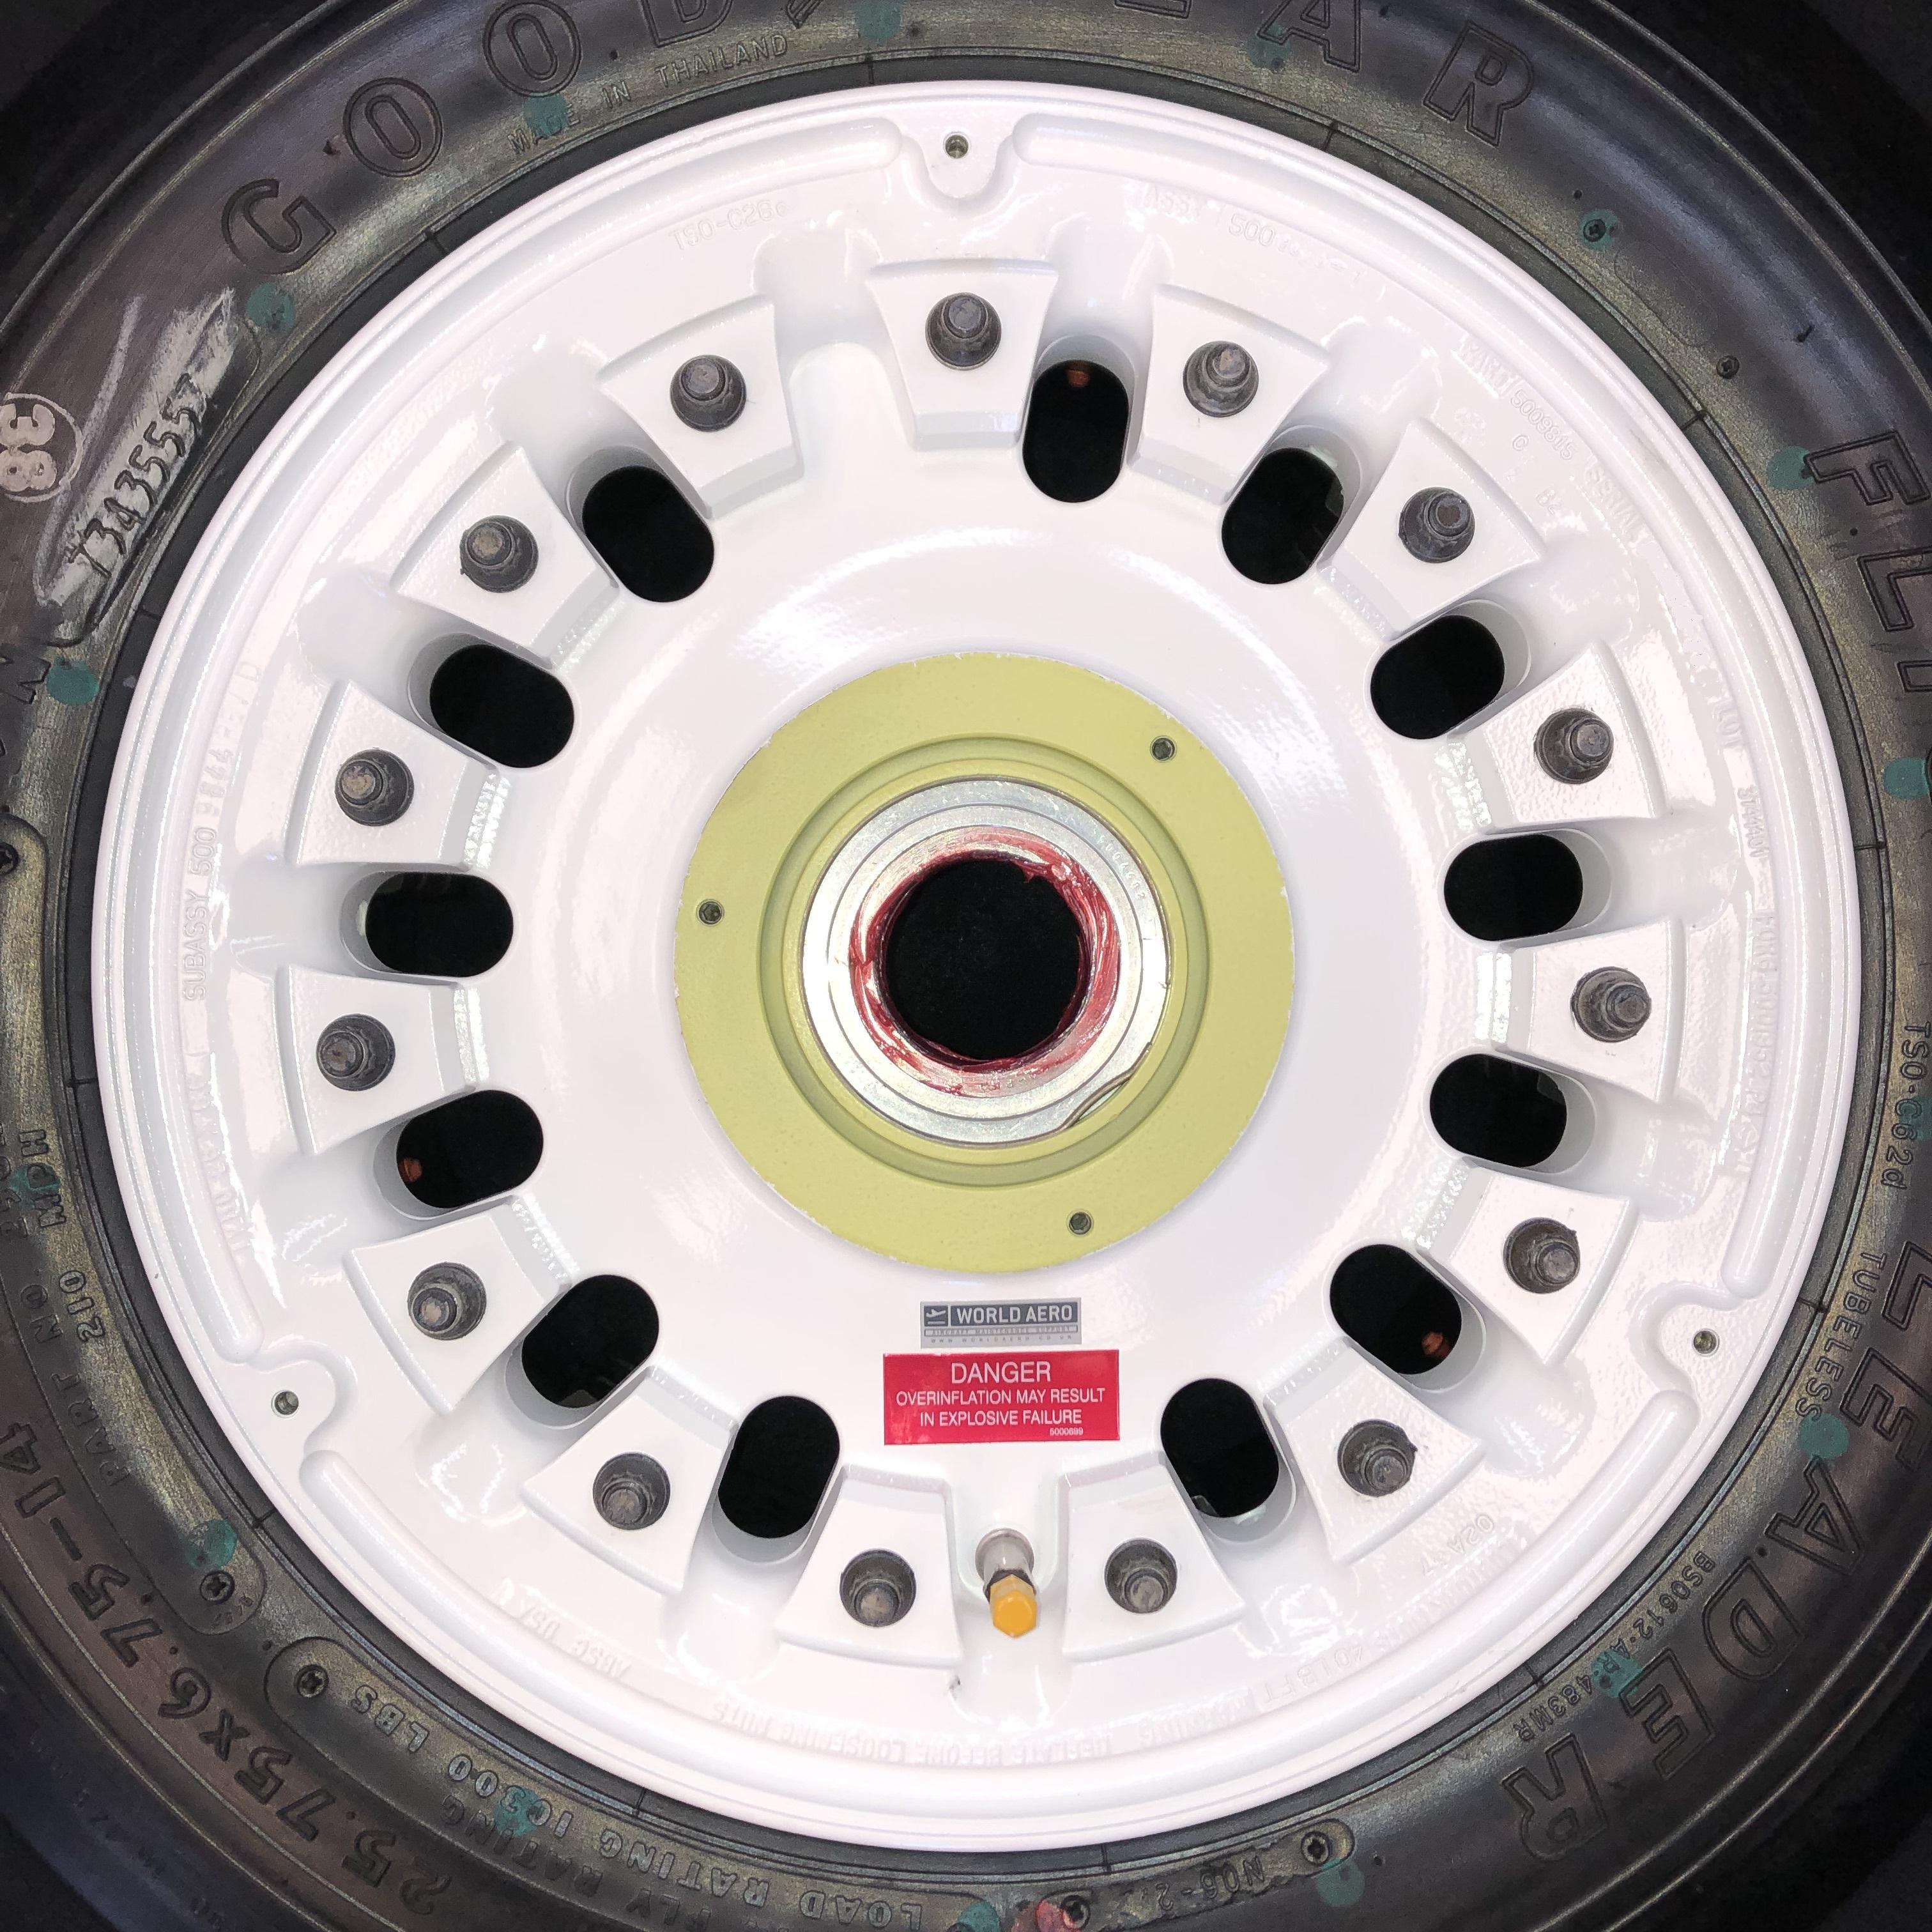 600-85123-15 Challenger 601 wheel